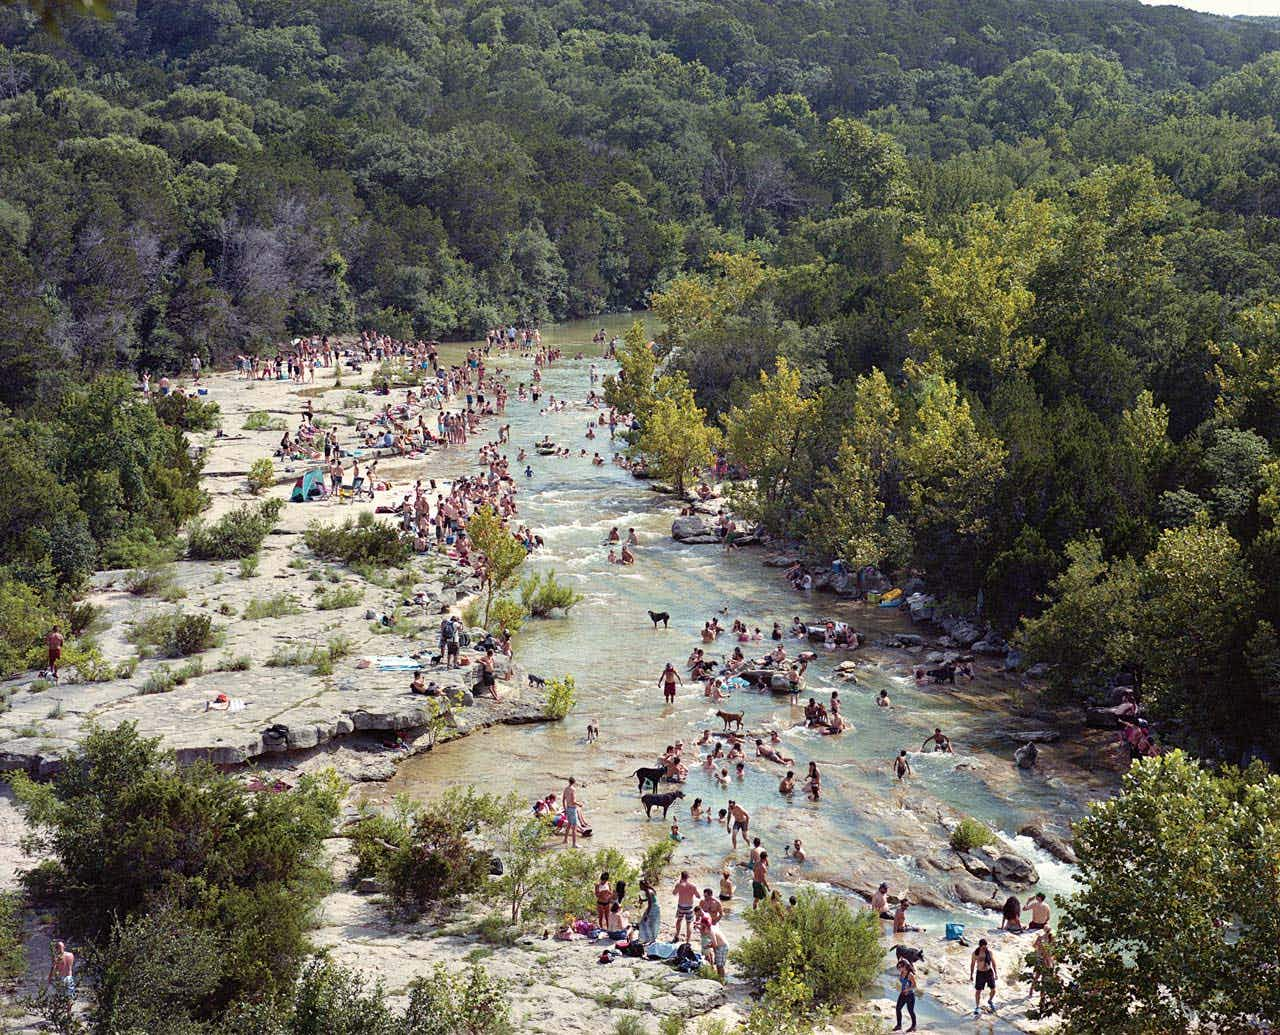 The Barton Creek Greenbelt.